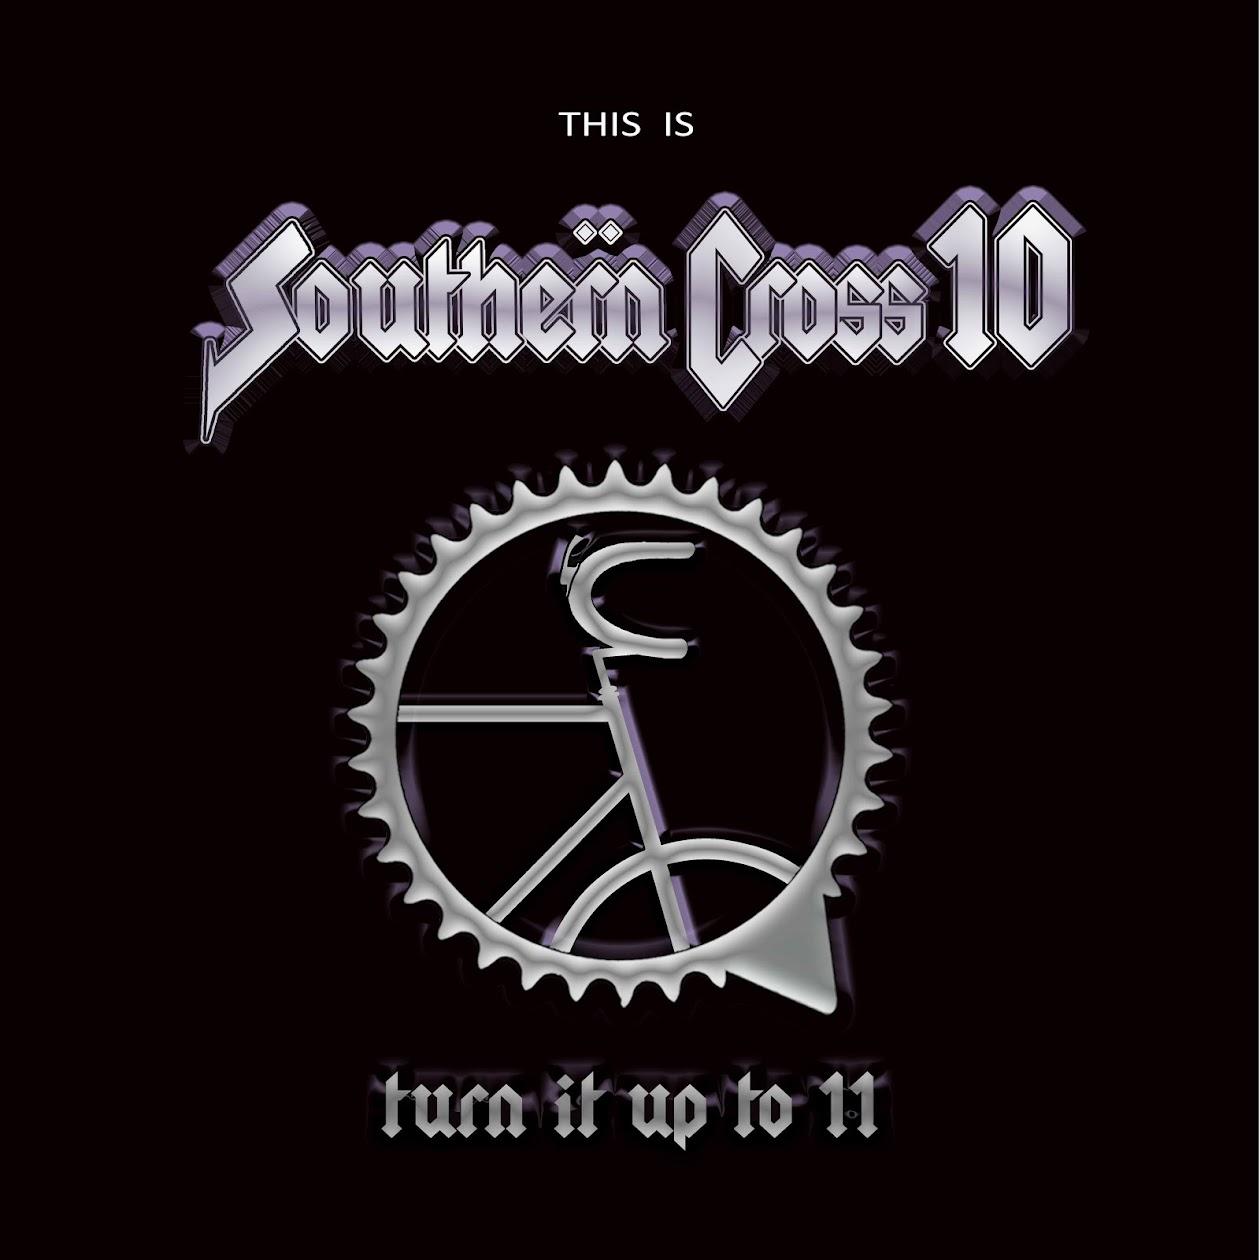 Southern Cross 2017